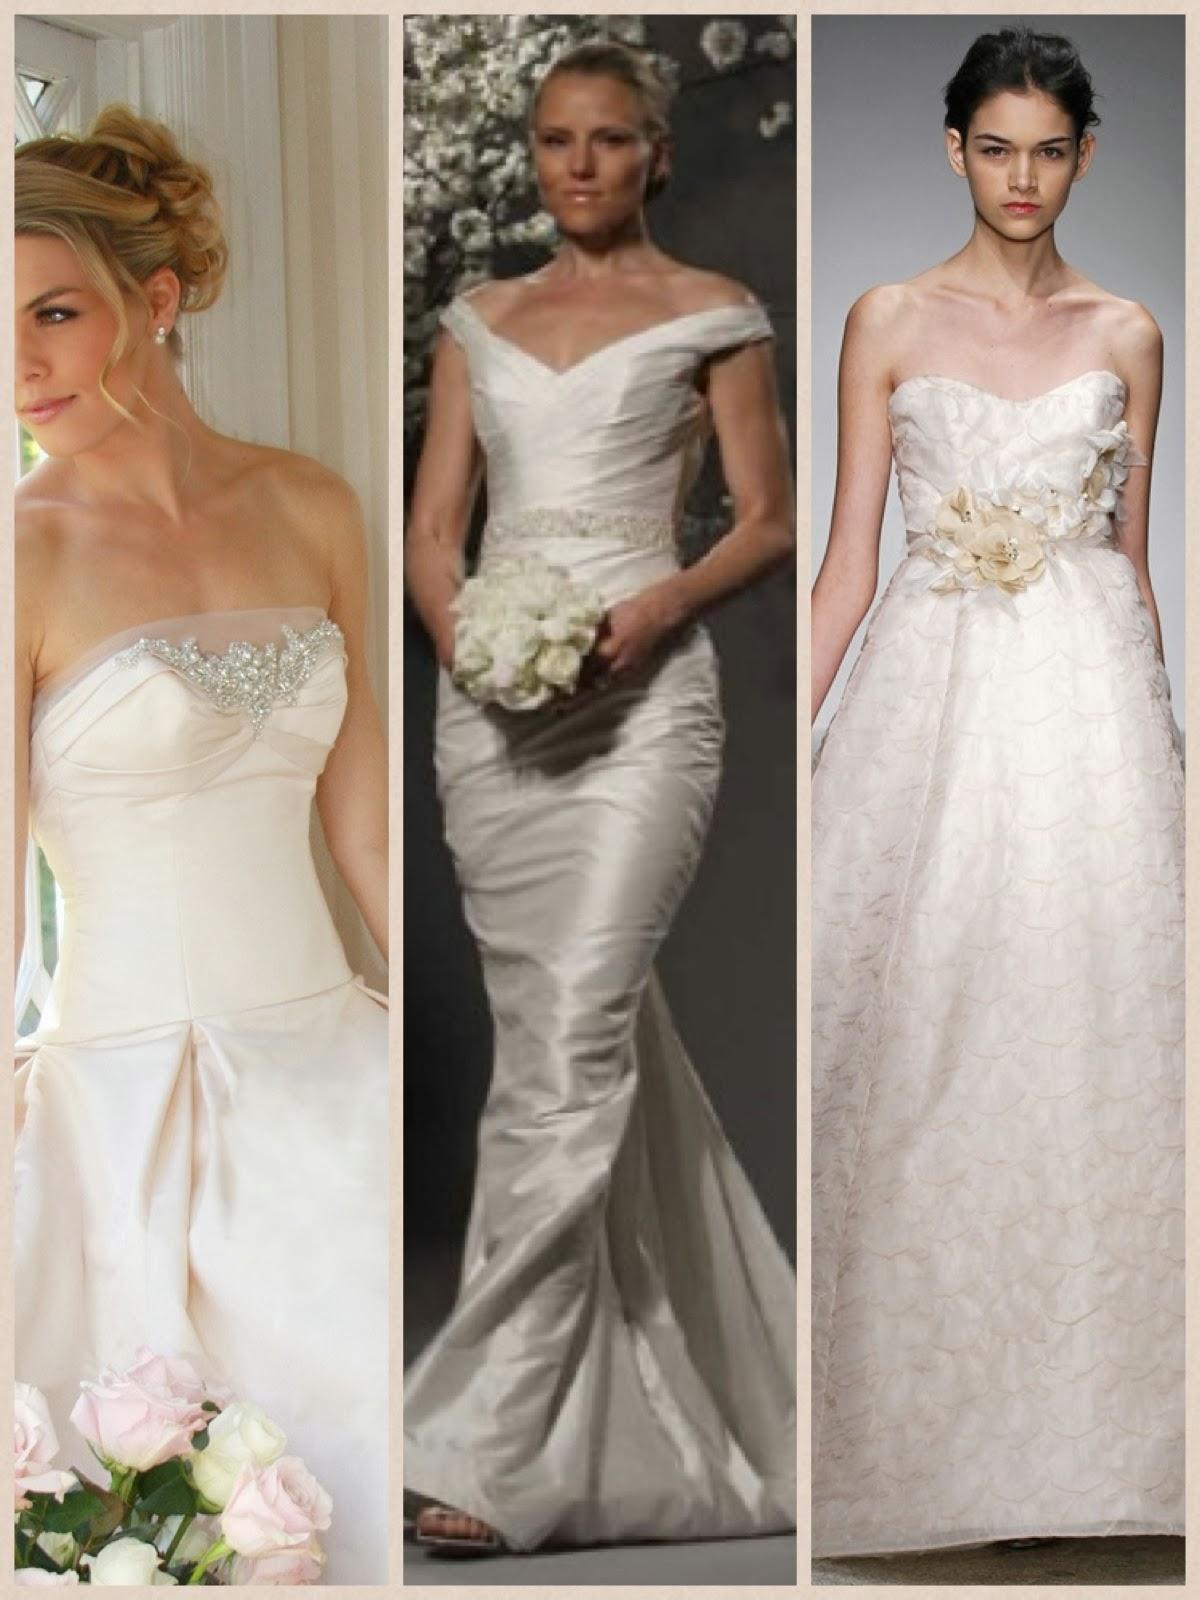 Trend Blush colored wedding gowns Atlanta, Ga | Atlanta Consignment ...